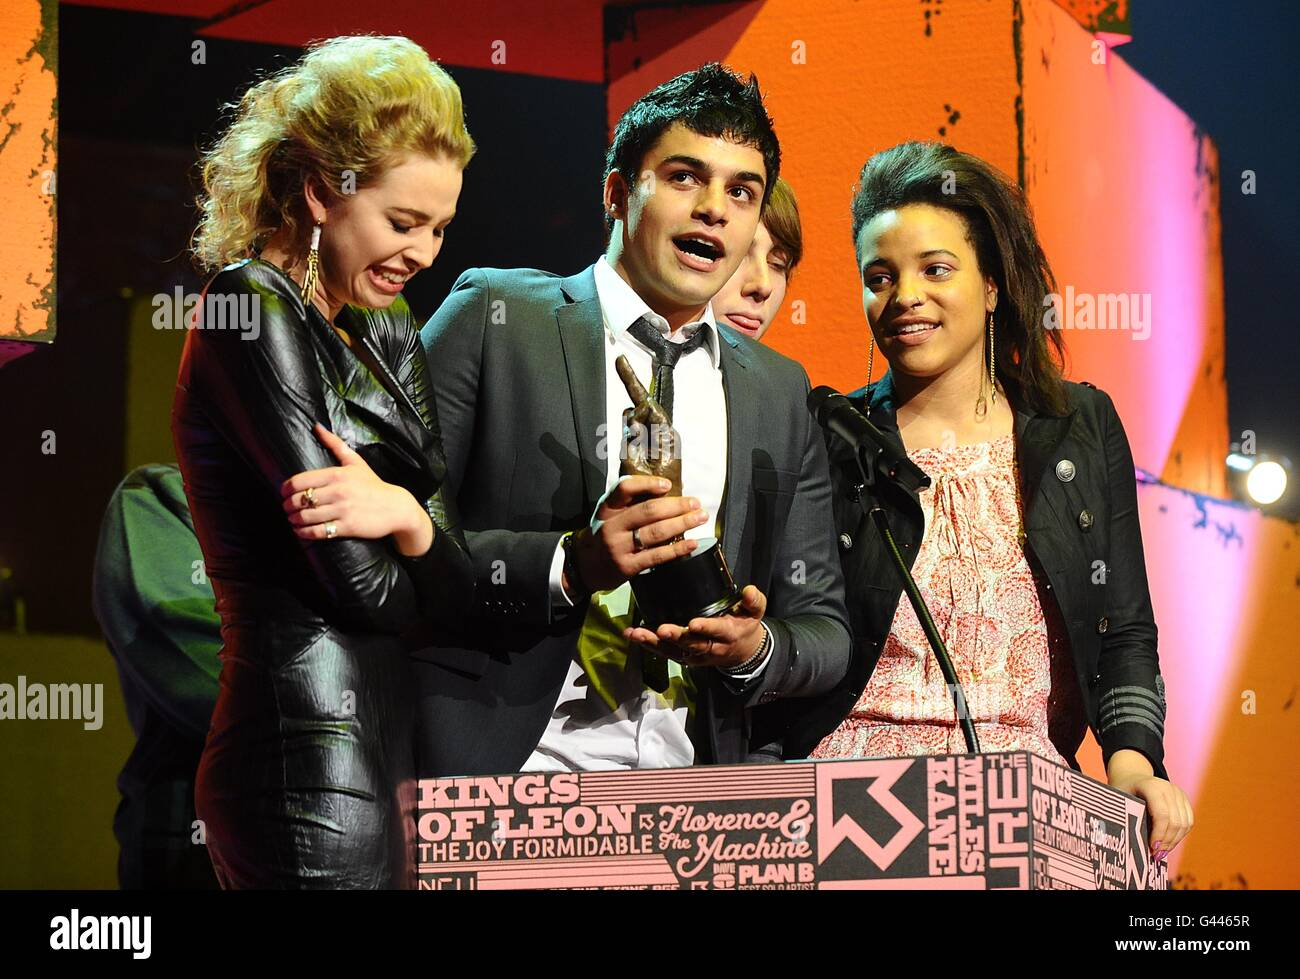 NME Awards 2011 - Show - London - Stock Image